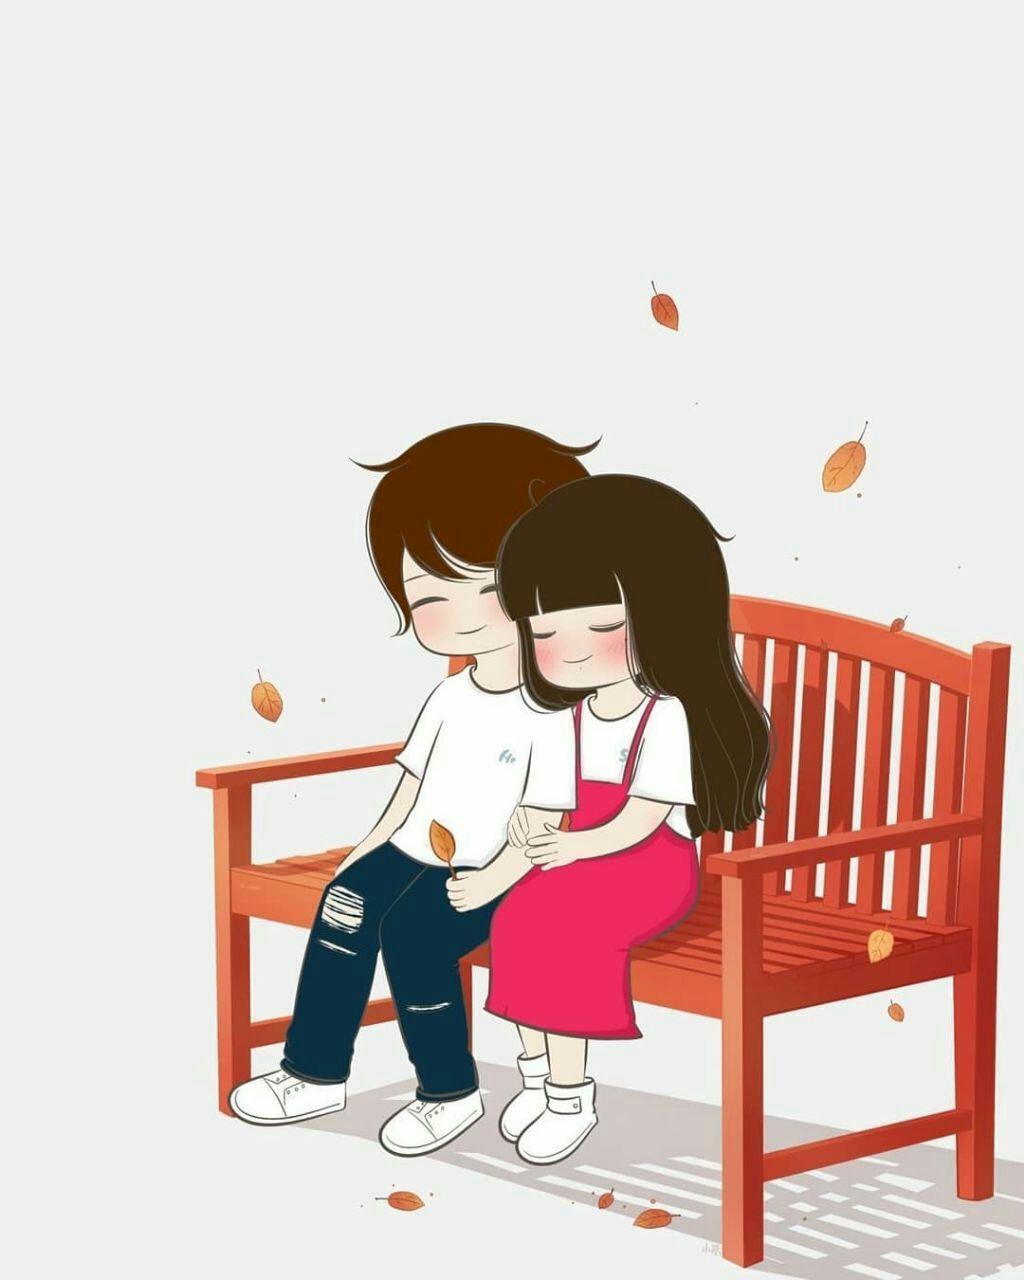 Pin On Web Pixer Couple cartoon love wallpaper full hd